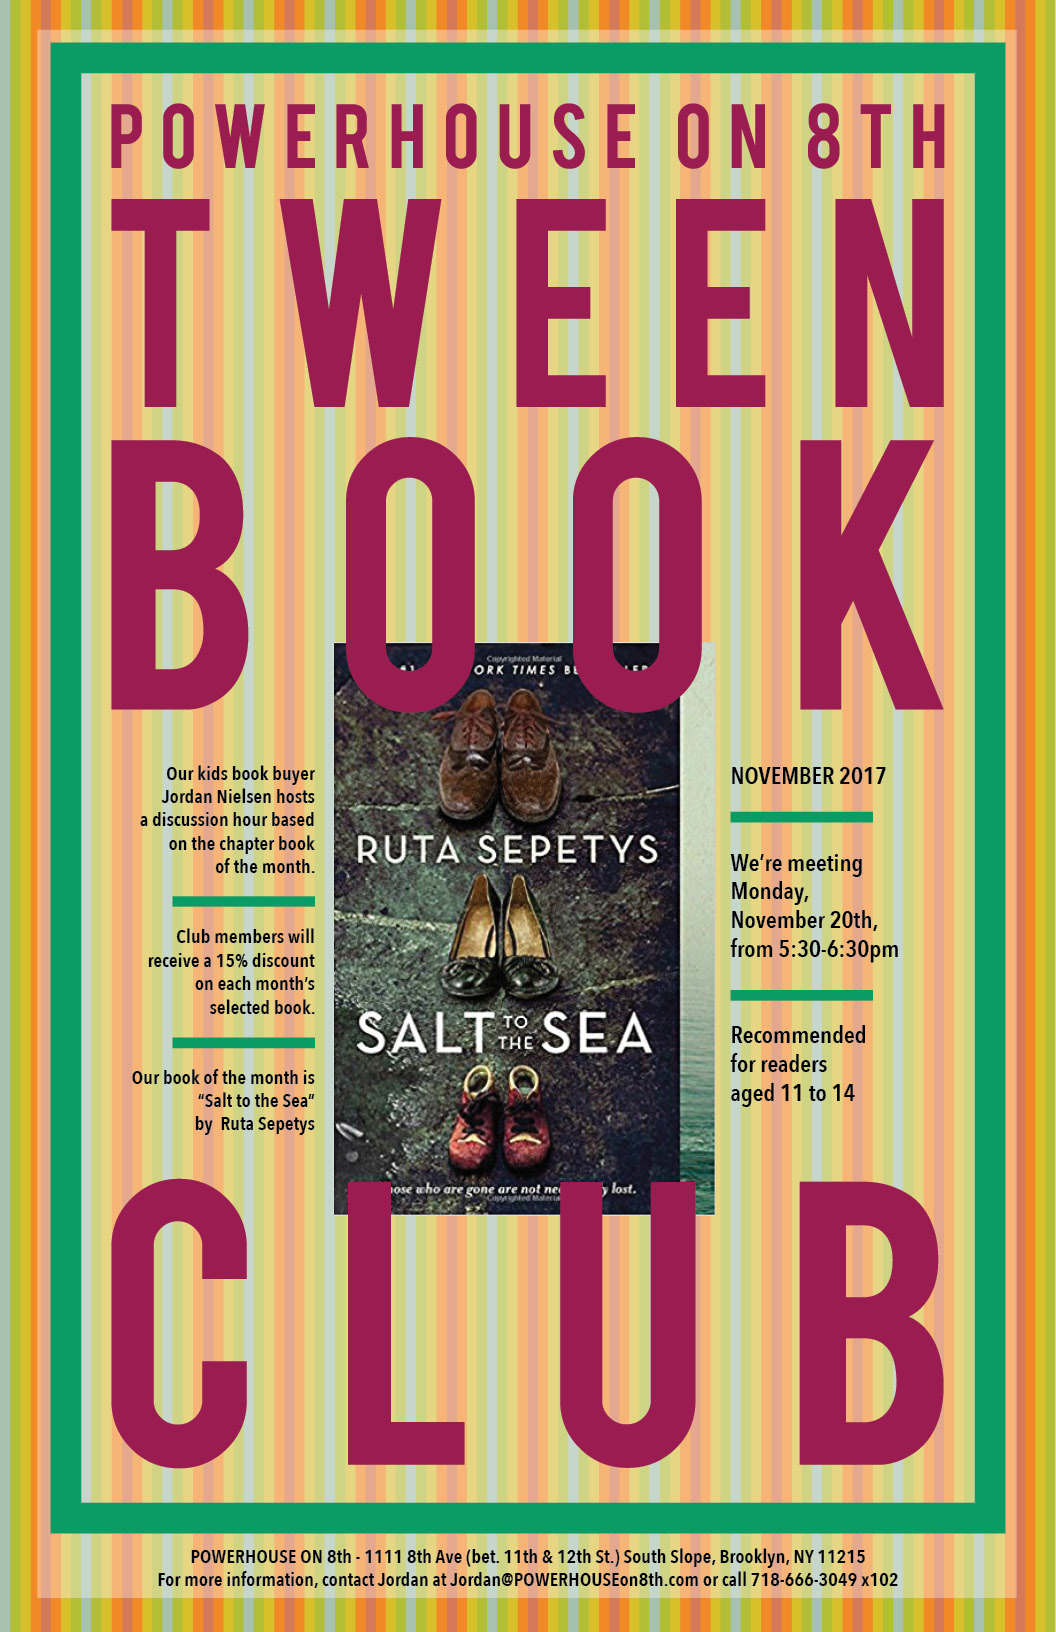 Tween Book Club: Salt to the Sea by Ruta Sepetys